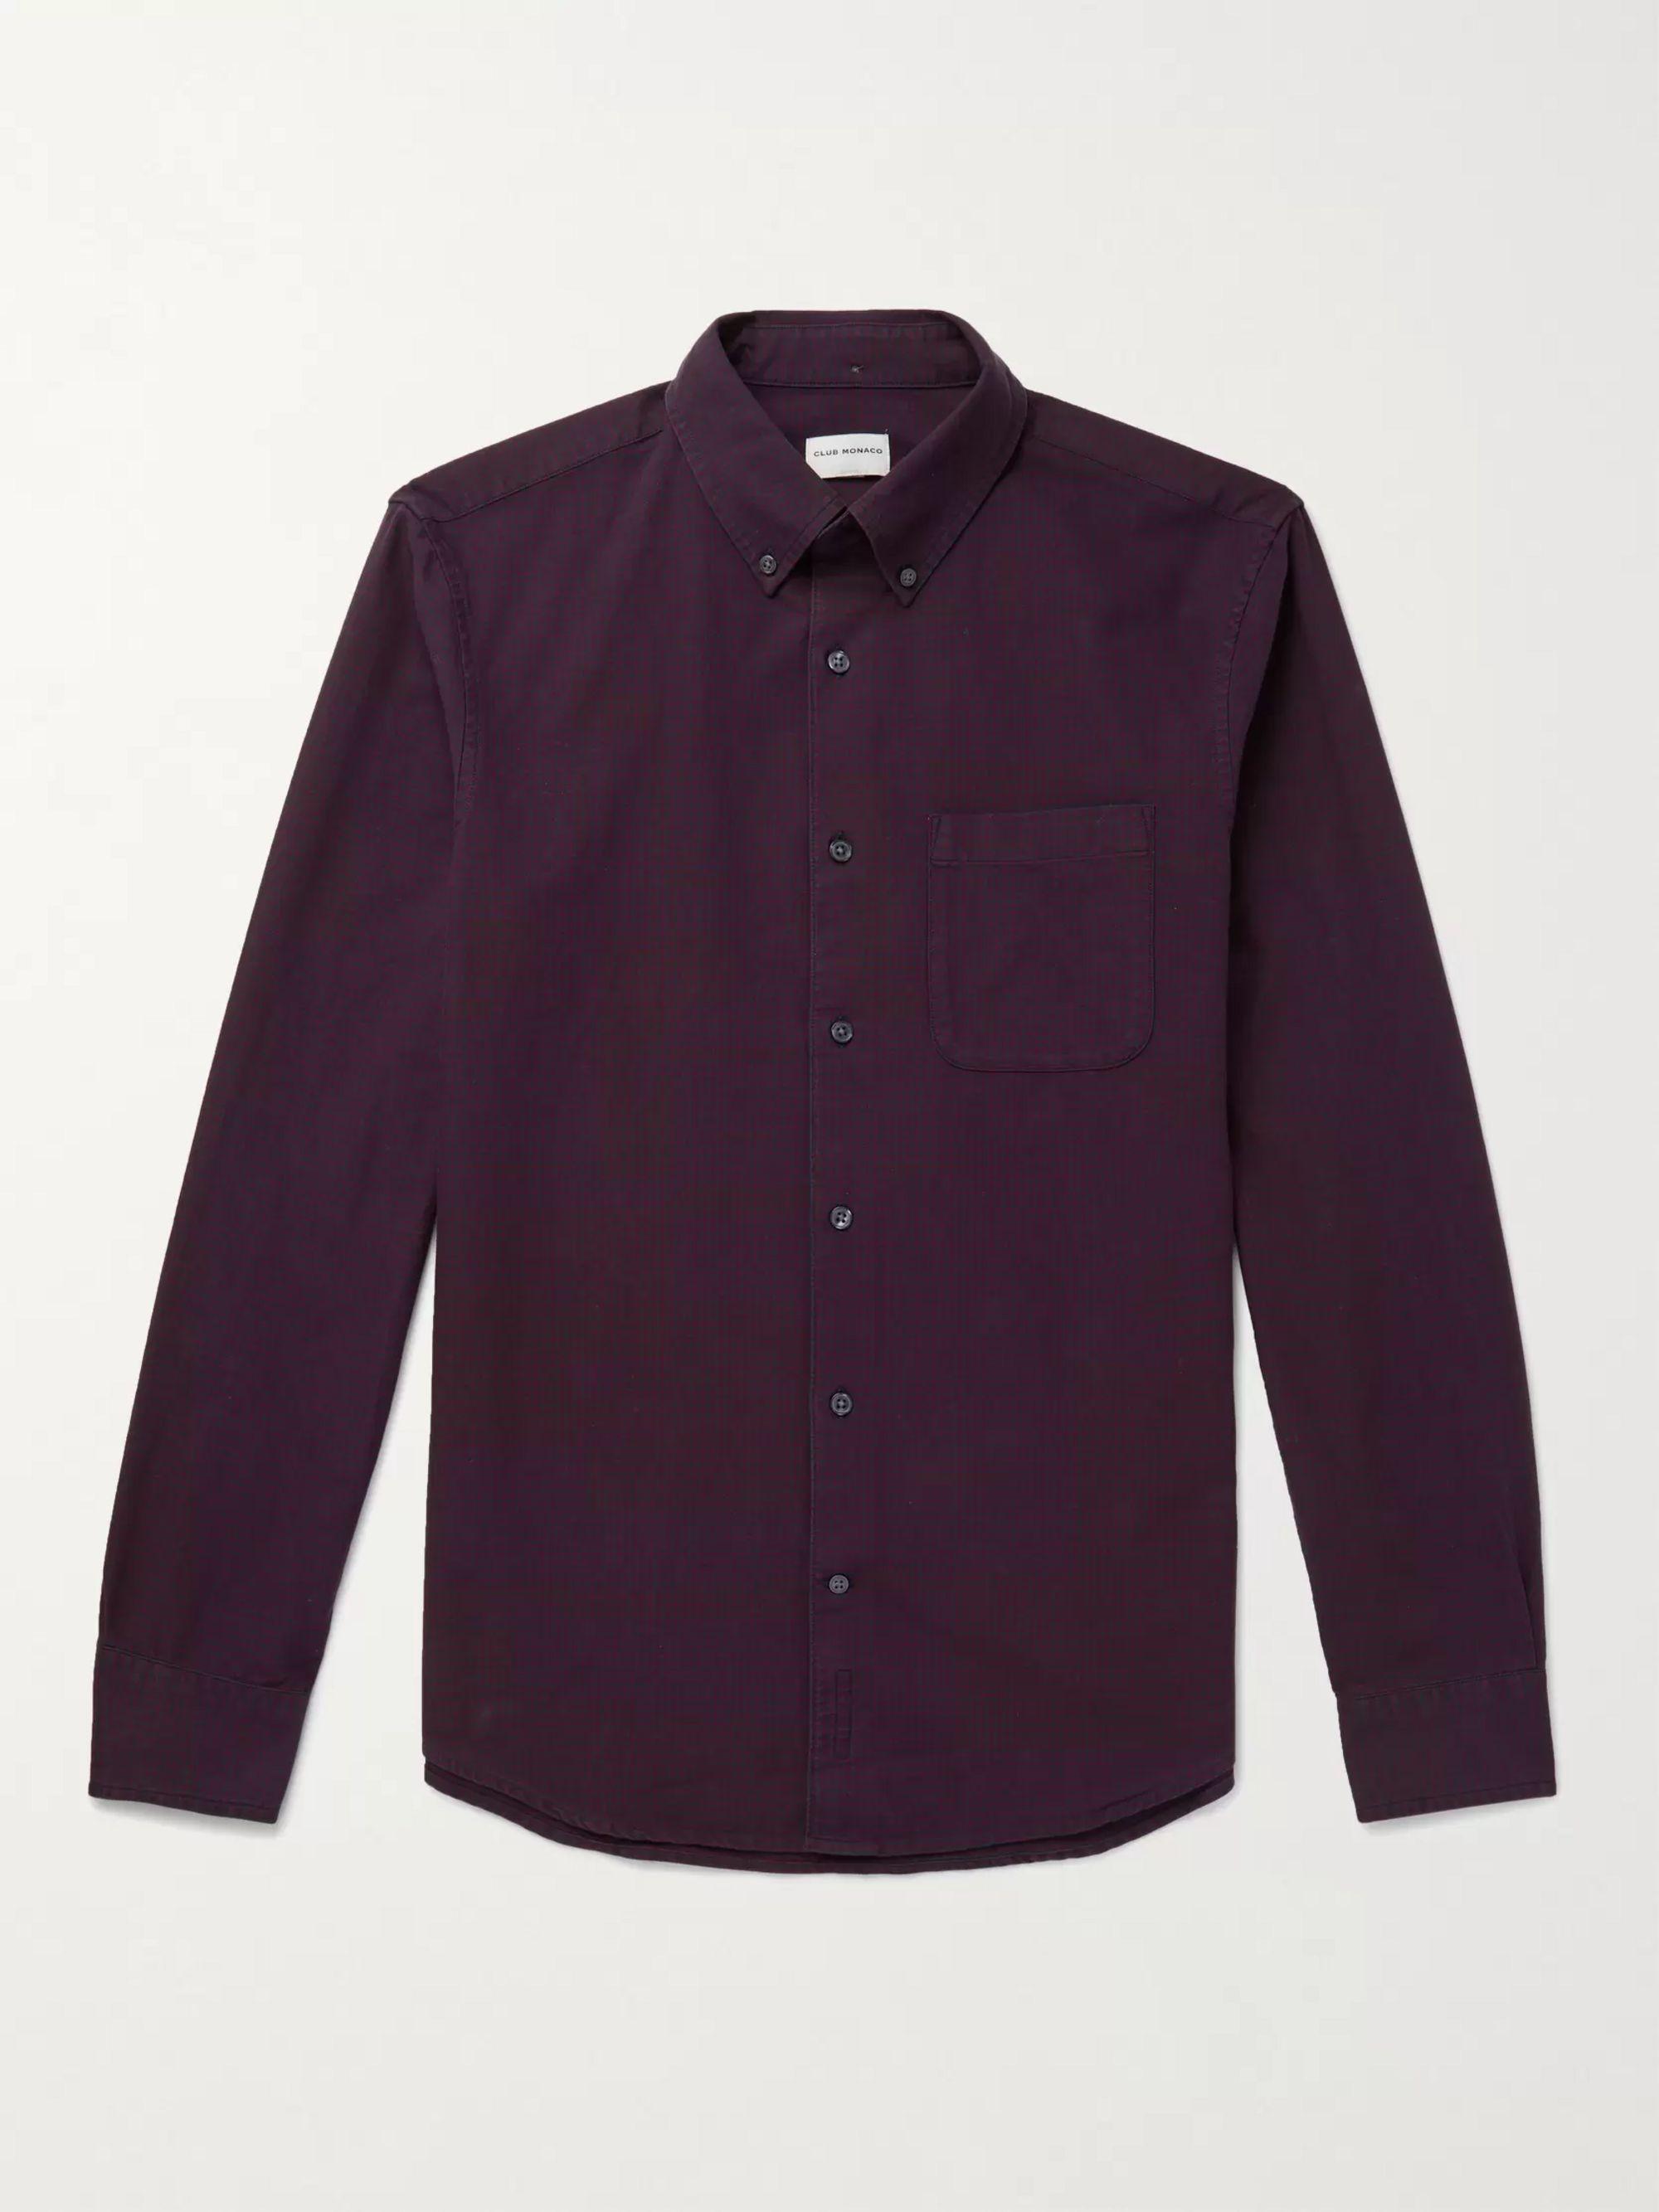 CLUB MONACO Slim-Fit Button-Down Collar Checked Cotton Oxford Shirt